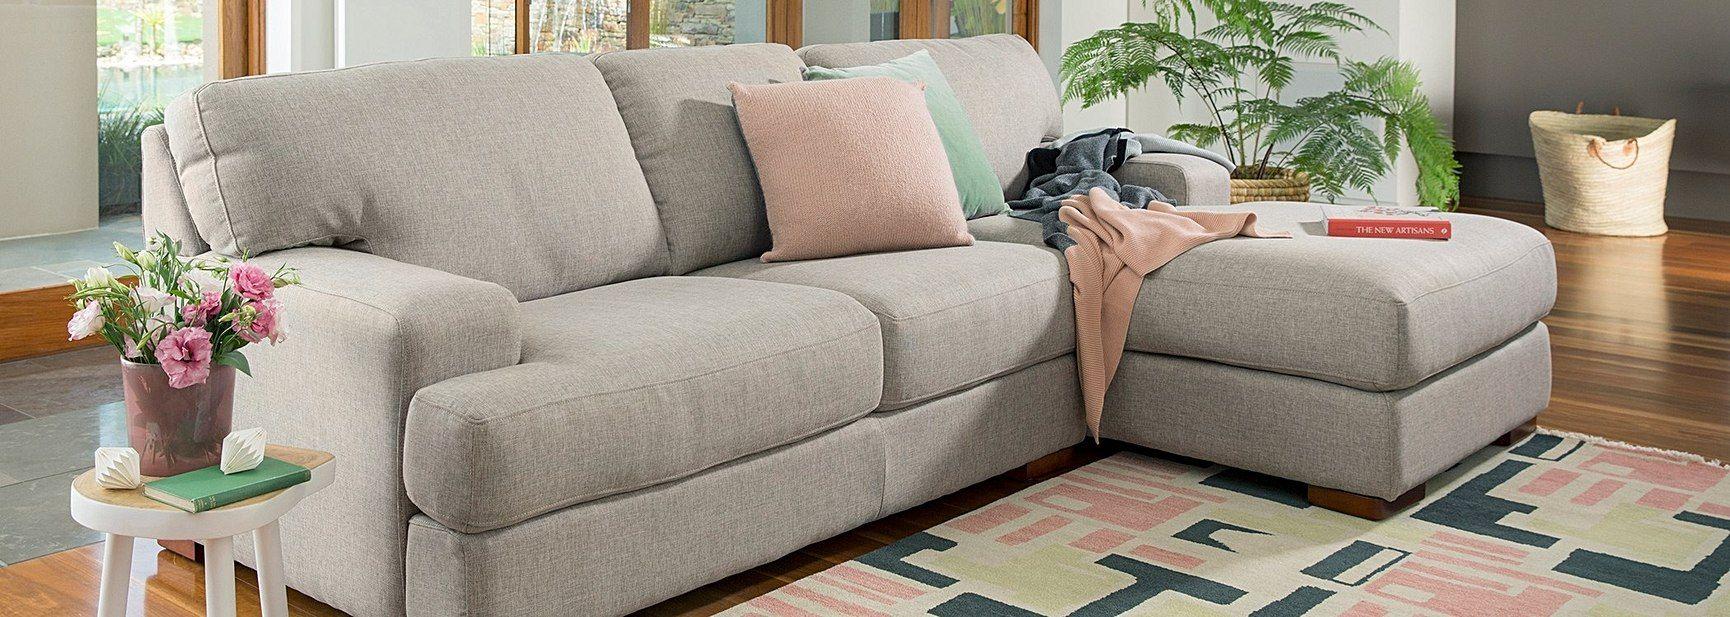 Melbourne Sofa Living Room Furniture Layout Plush Furniture Plush Sofa